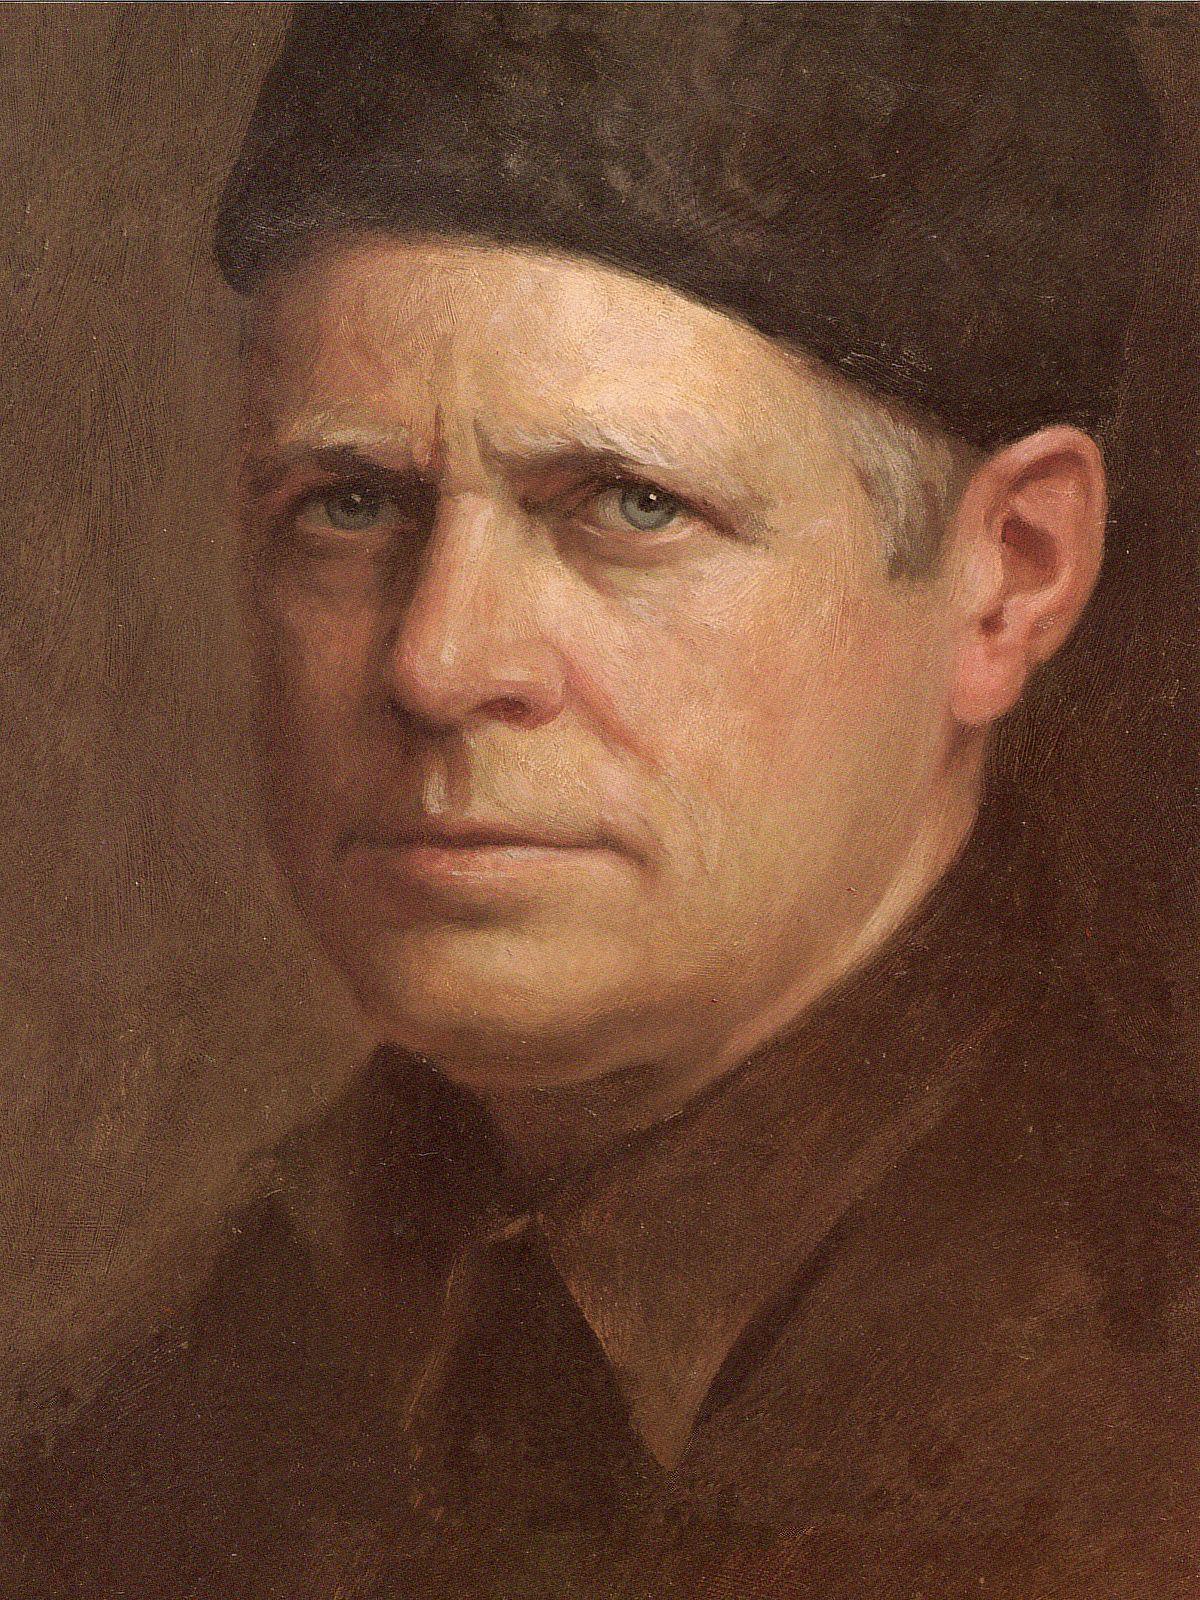 Herbert Abrams - Wikipedia